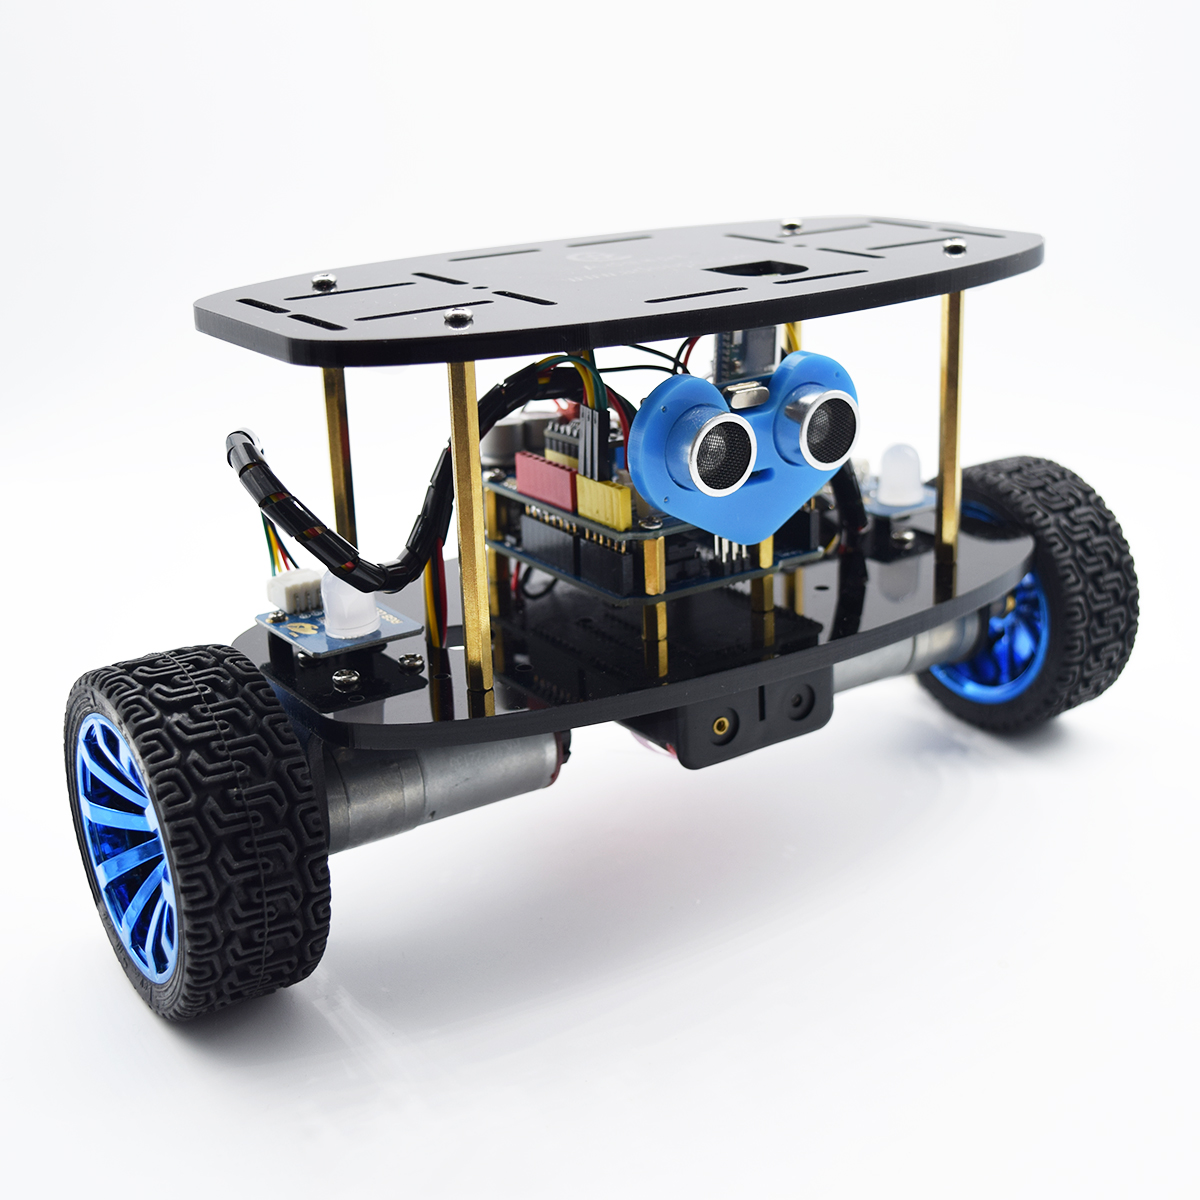 Adeept 2-Wheel Self-Balancing Upright Car Robot Kit for